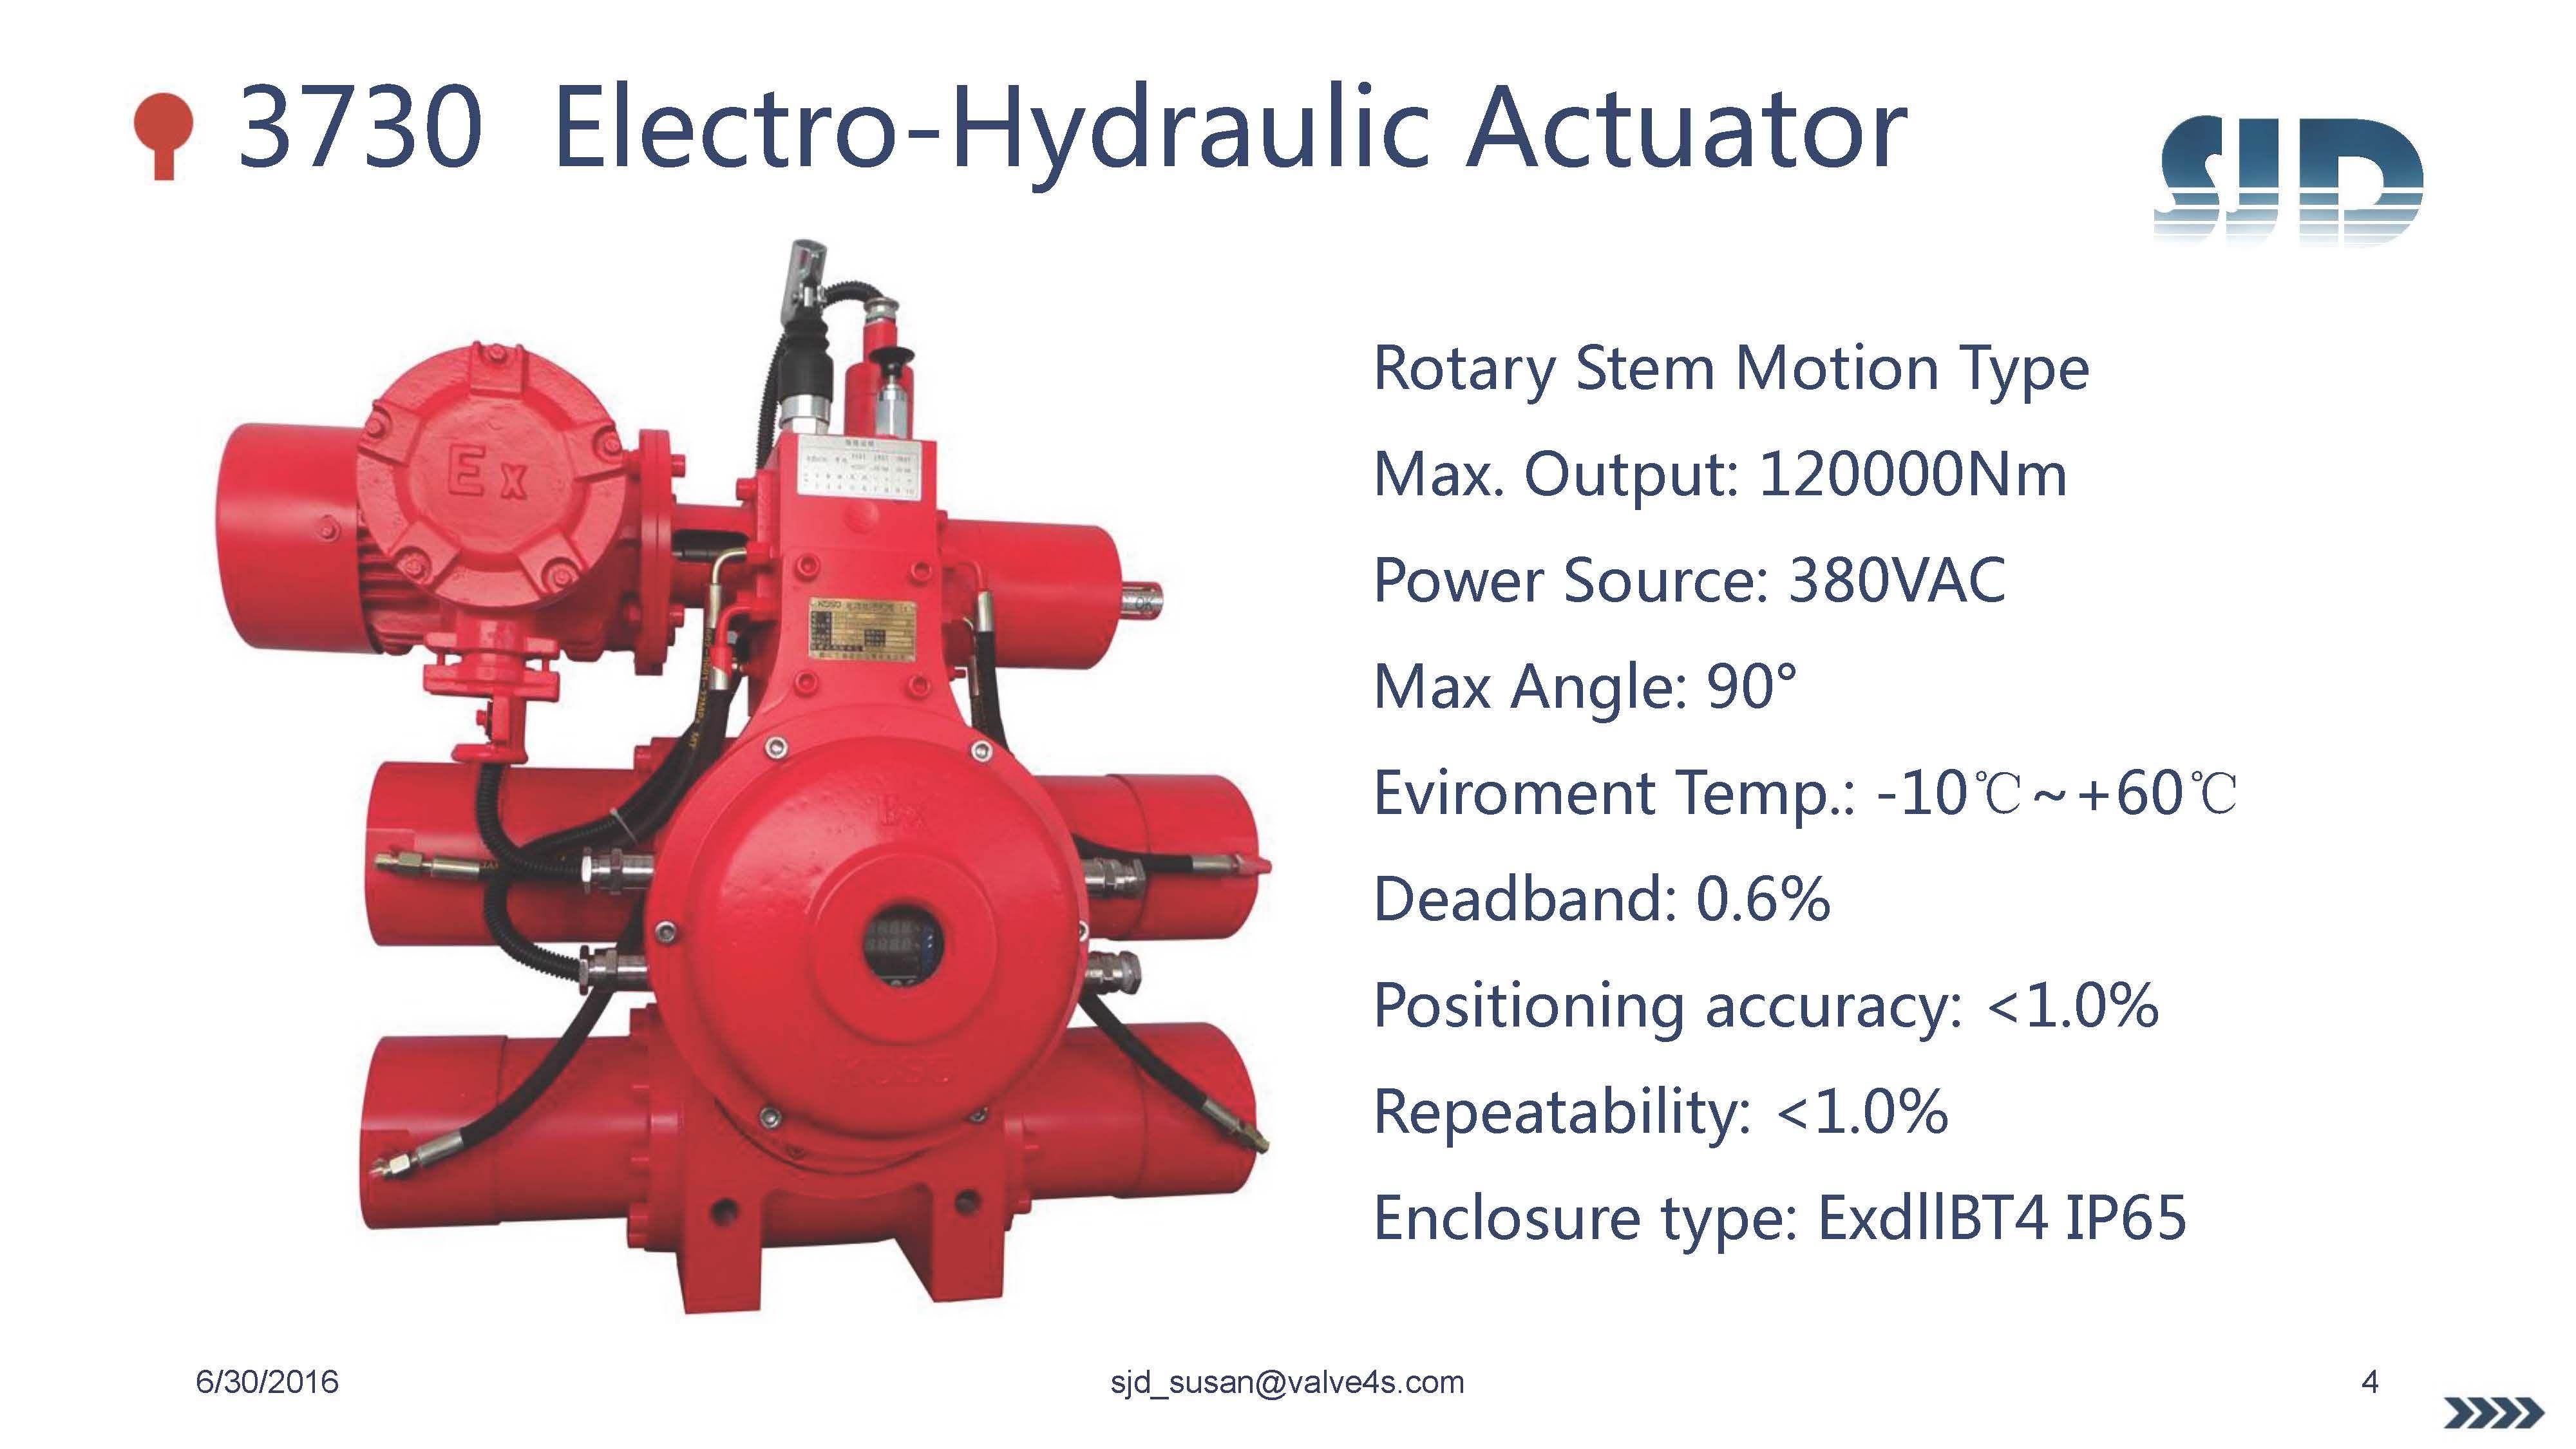 3730 electro hydraulic actuator amazing electric control valves 3730 electro hydraulic actuator amazing electric control valves and actuators pinterest control valves swarovskicordoba Gallery